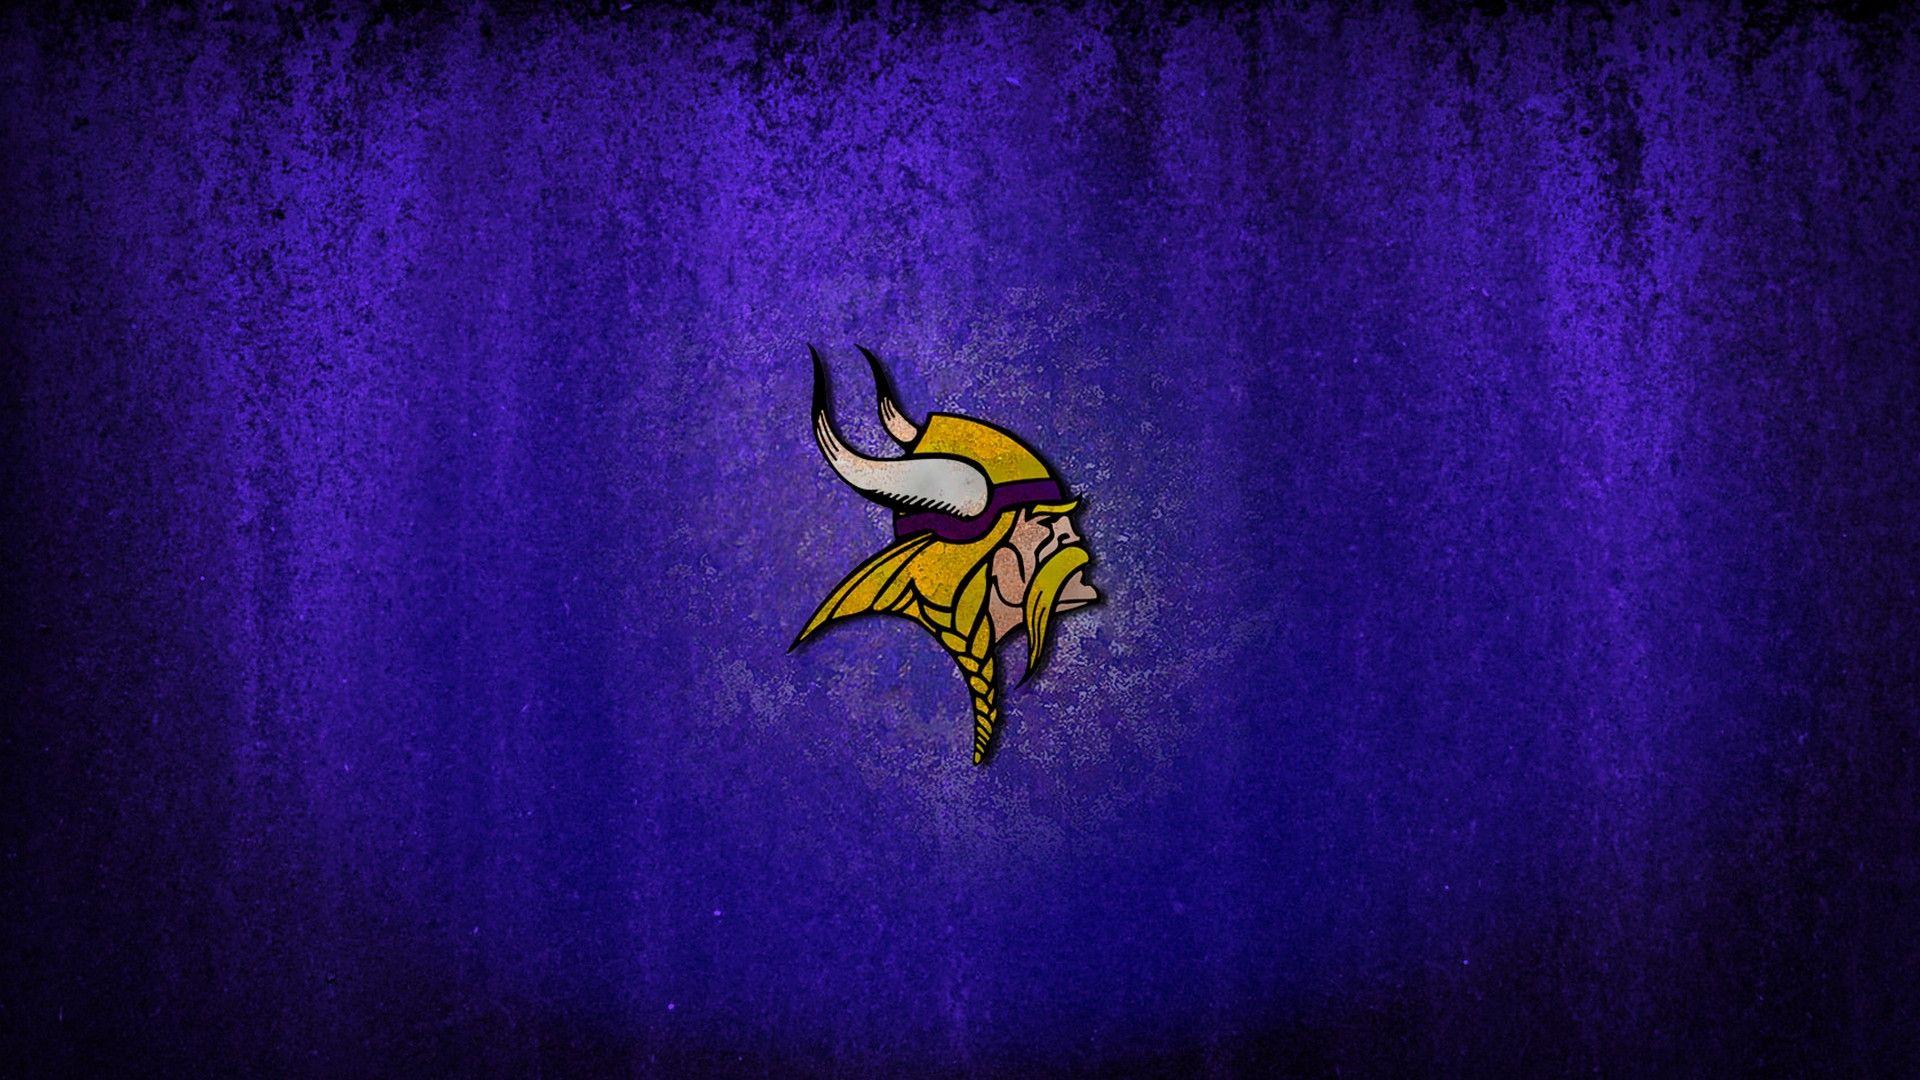 Minnesota Vikings hd wallpaper